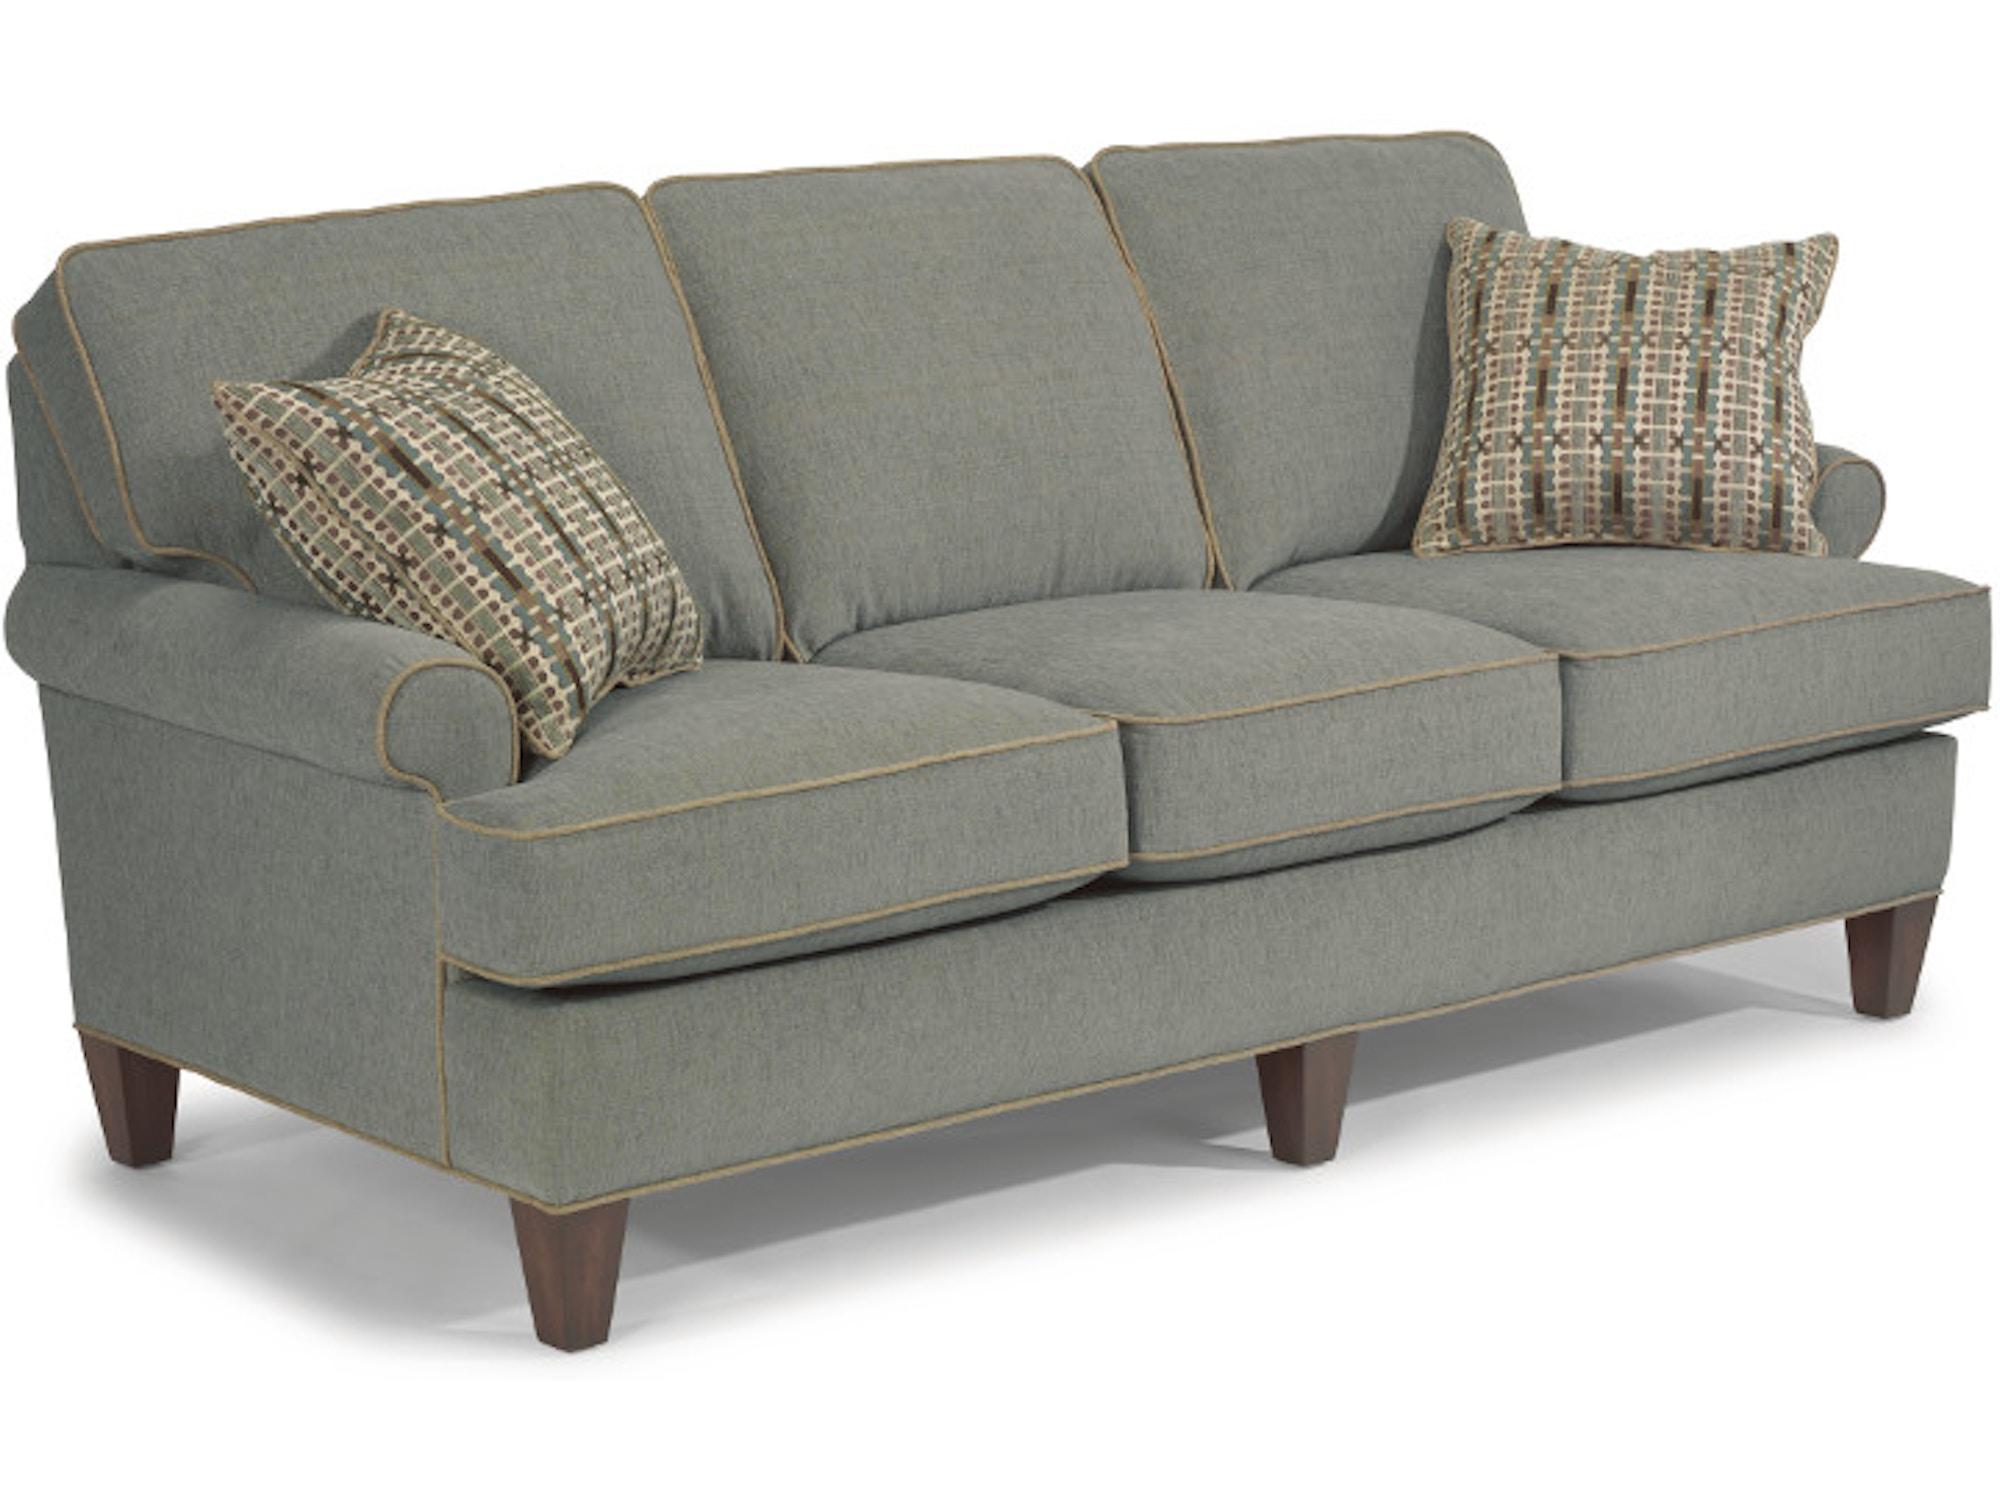 Flex Steel Sofas Flexsteel Westside Jasen S Fine Furniture Since 1951 Thesofa